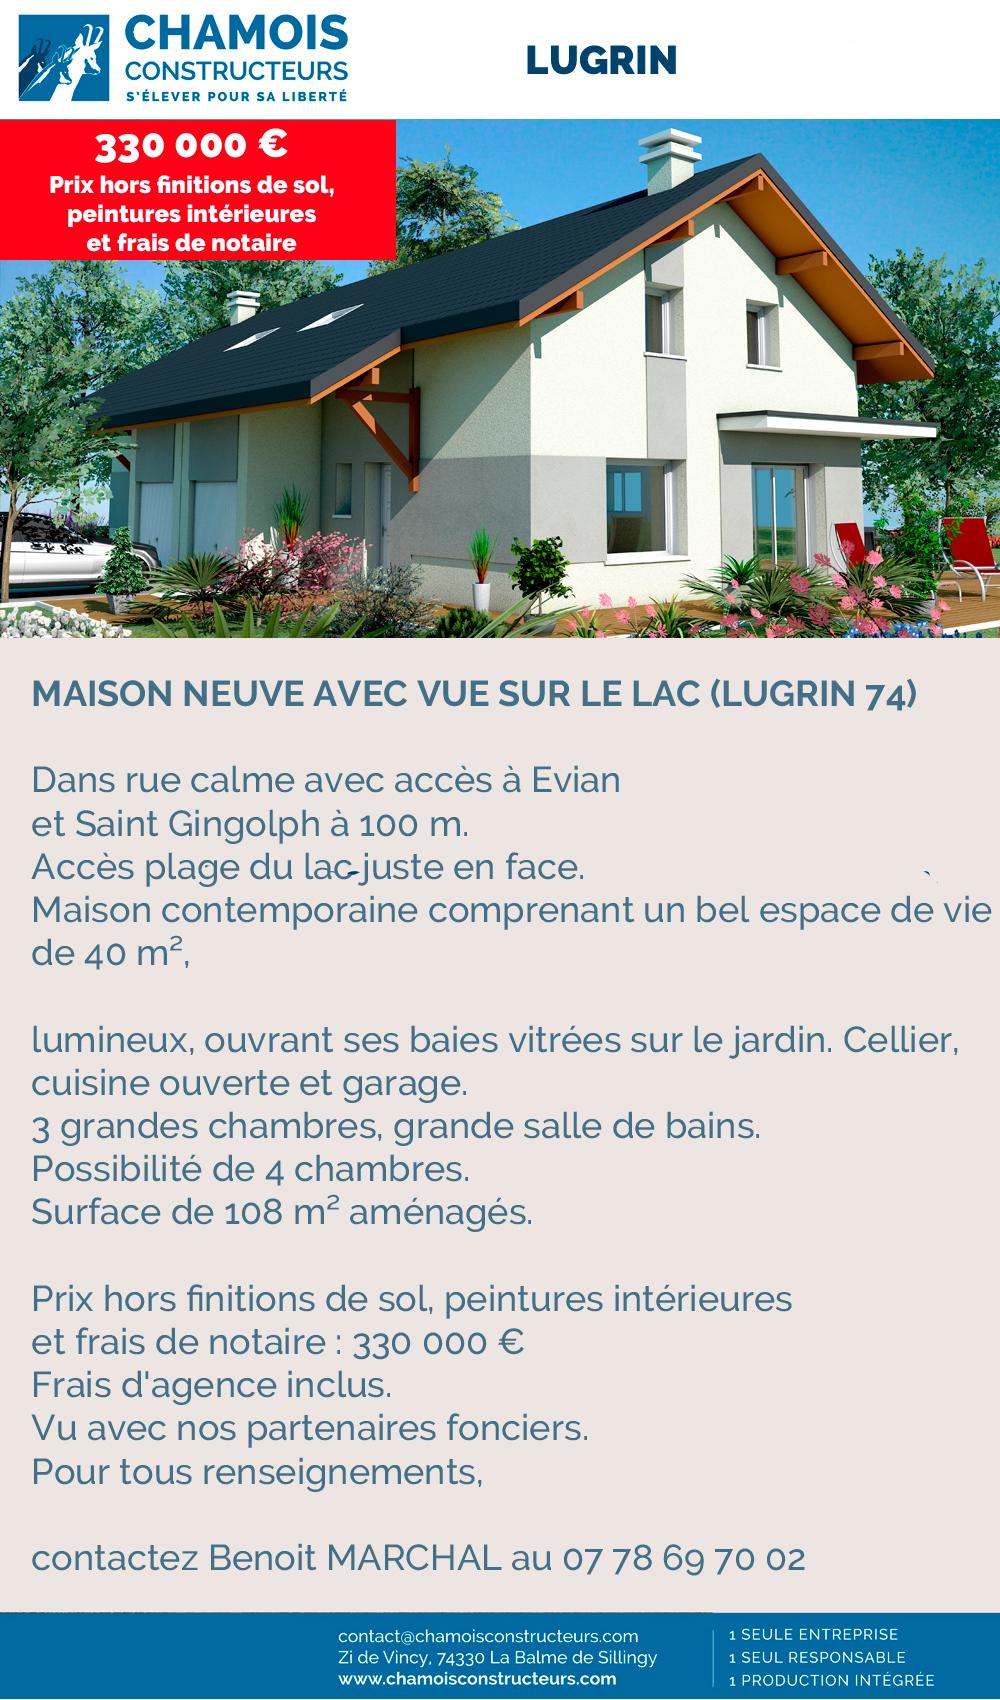 St Gingolph